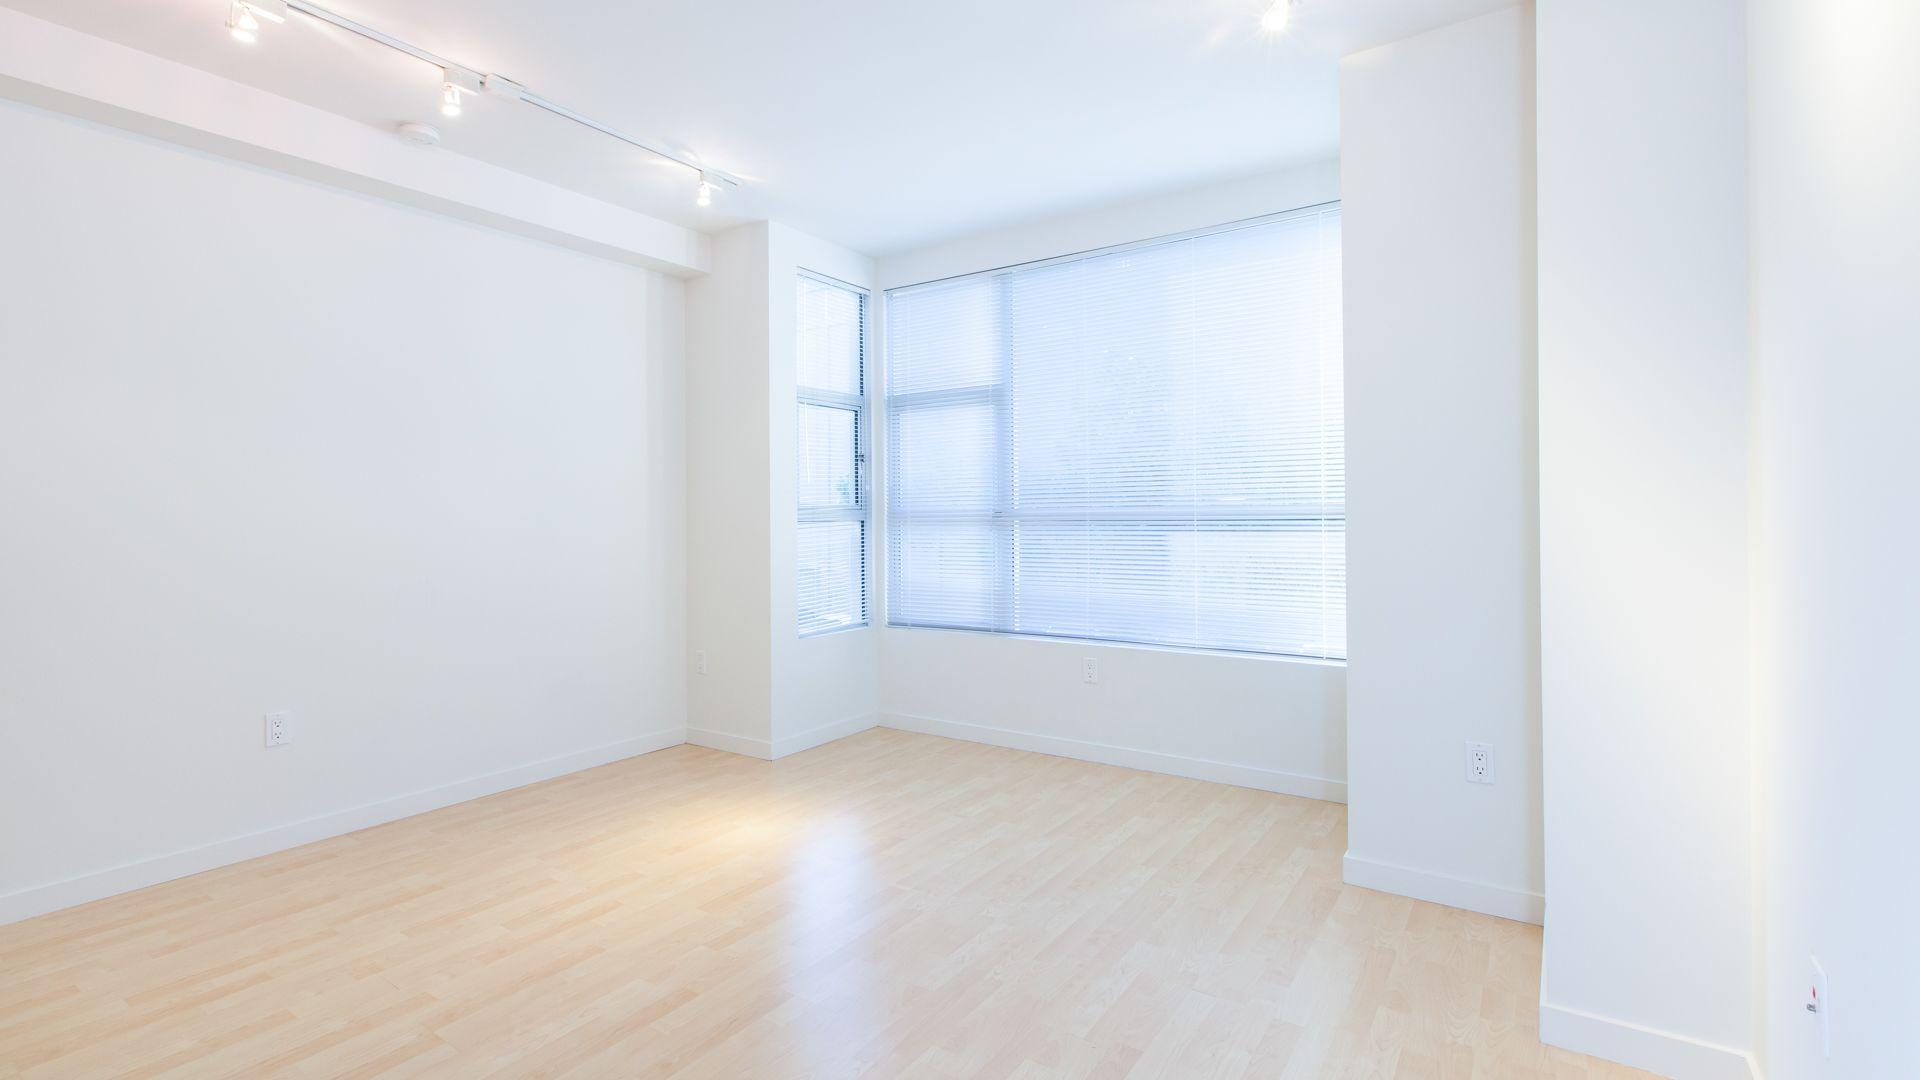 77 Bluxome Apartments - Studio